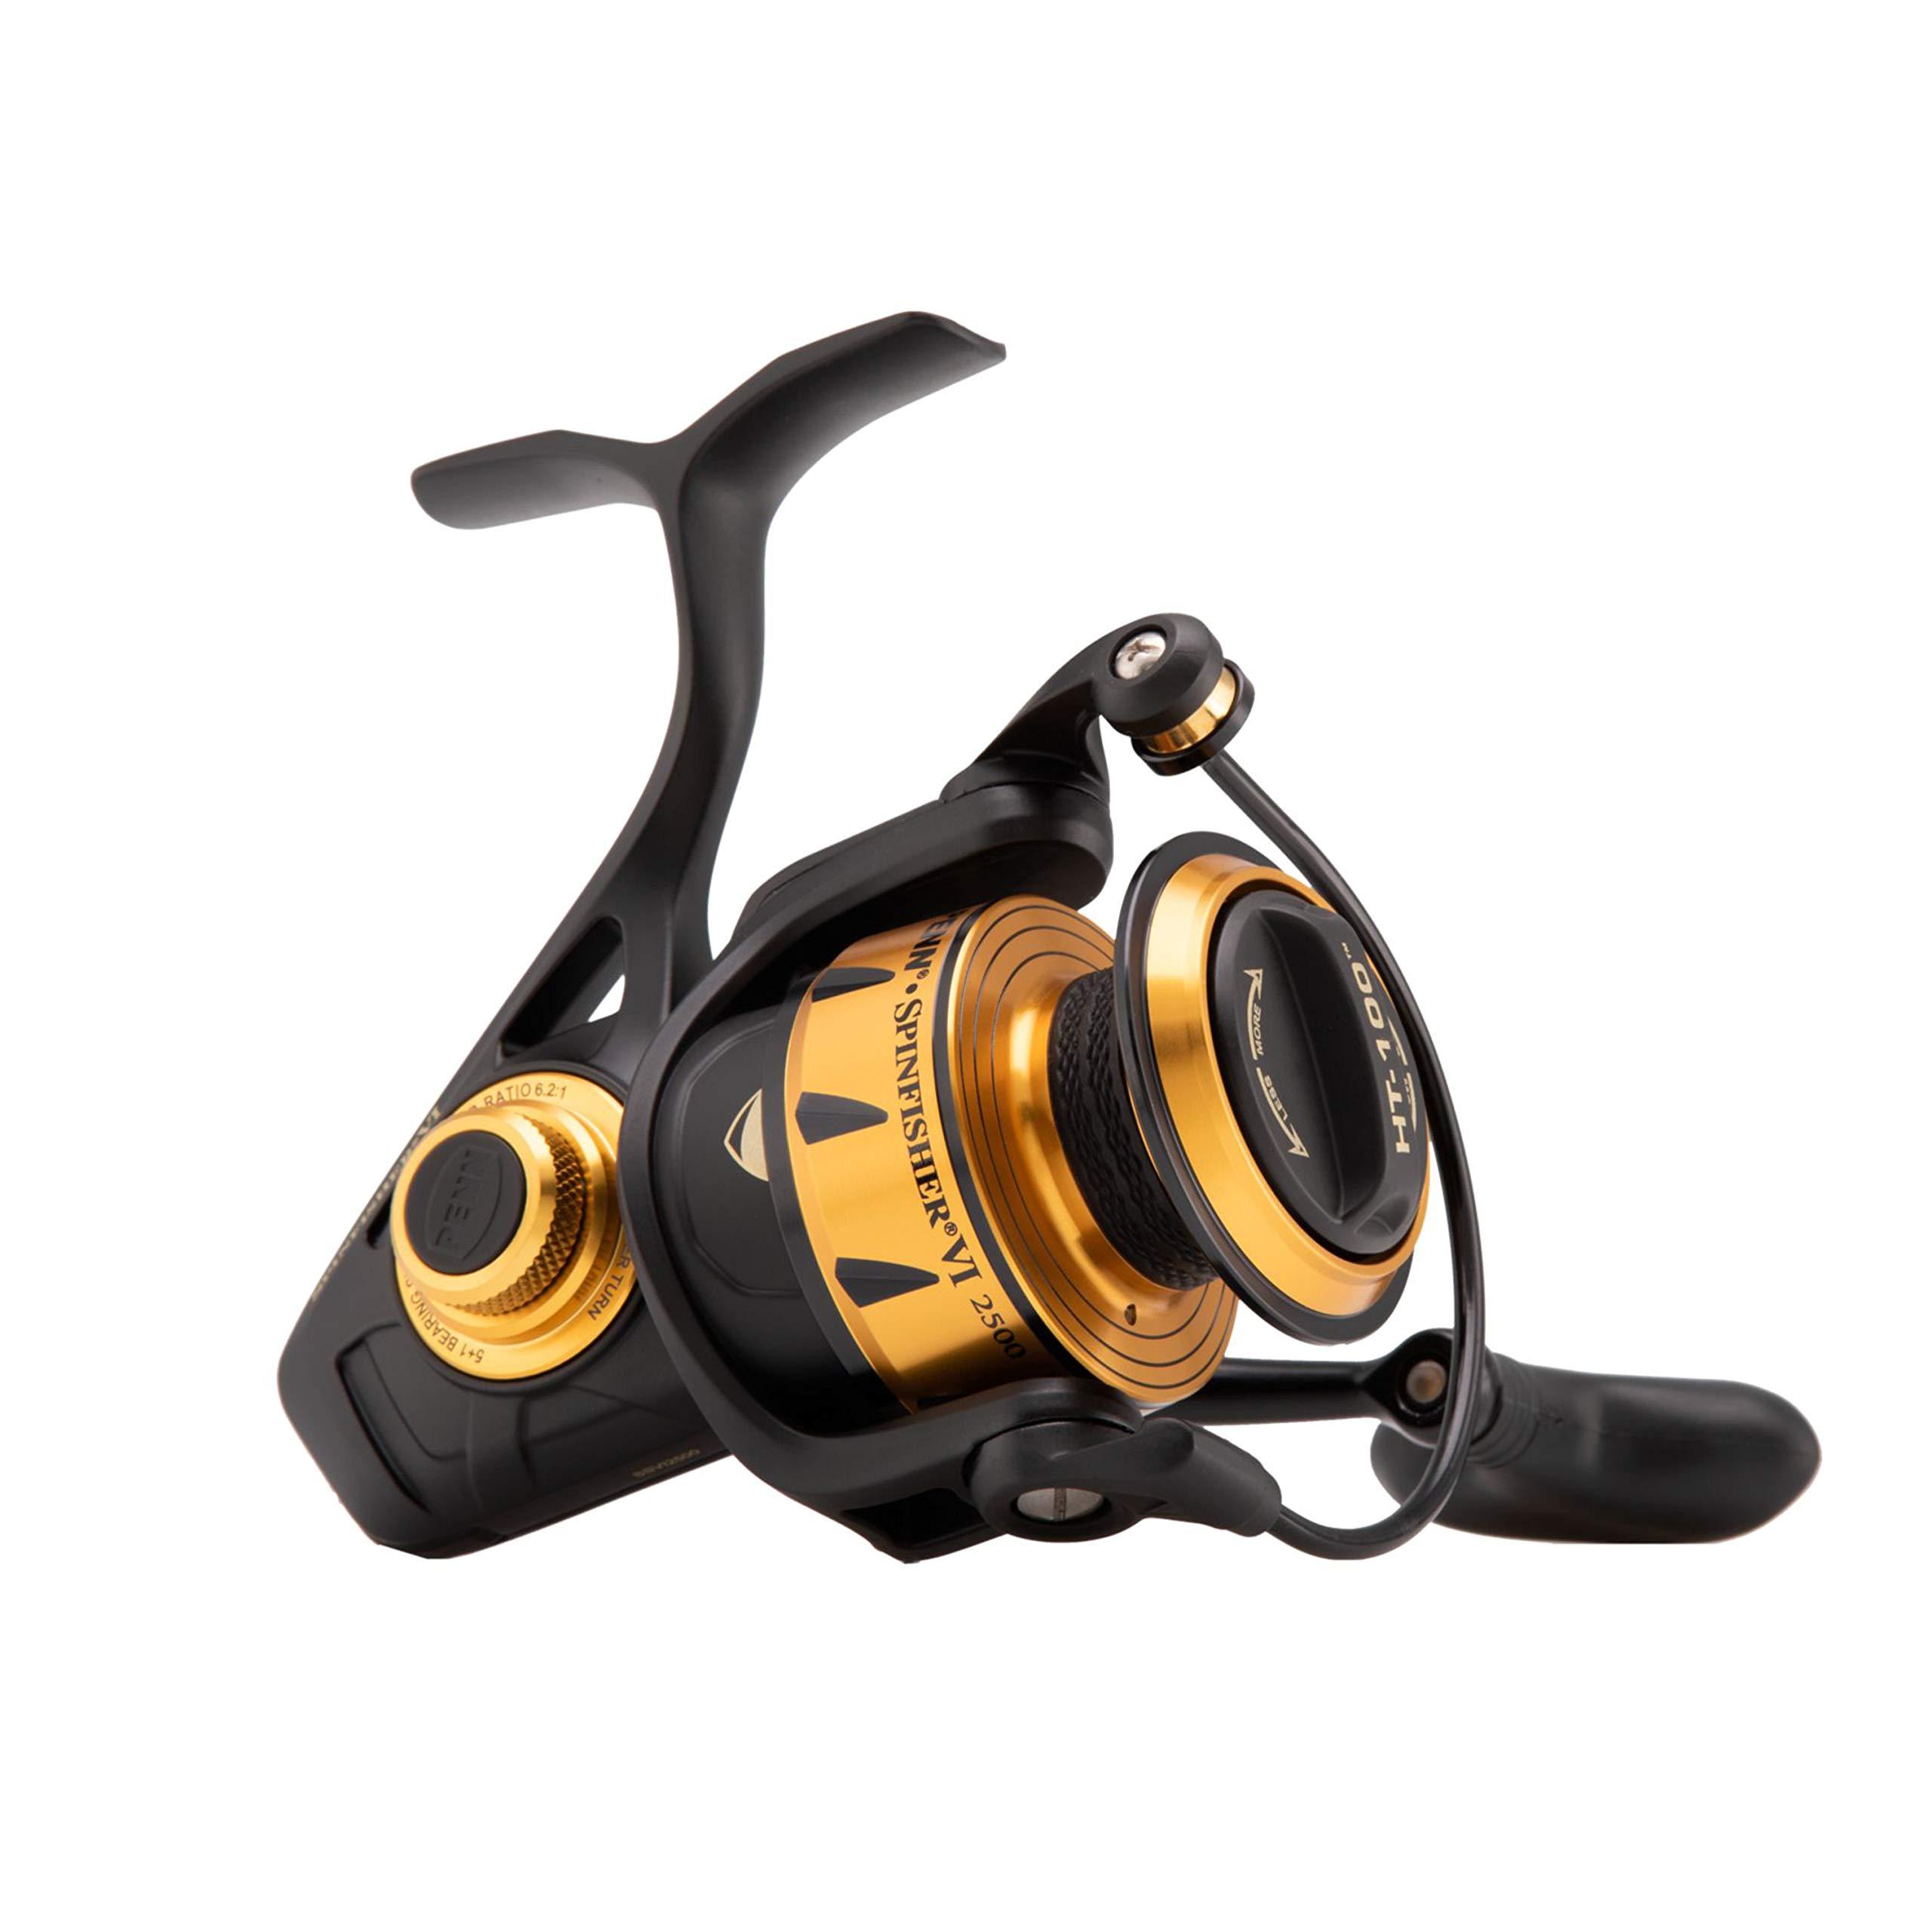 Penn, Spinfisher Liner Saltwater Spinning Reel